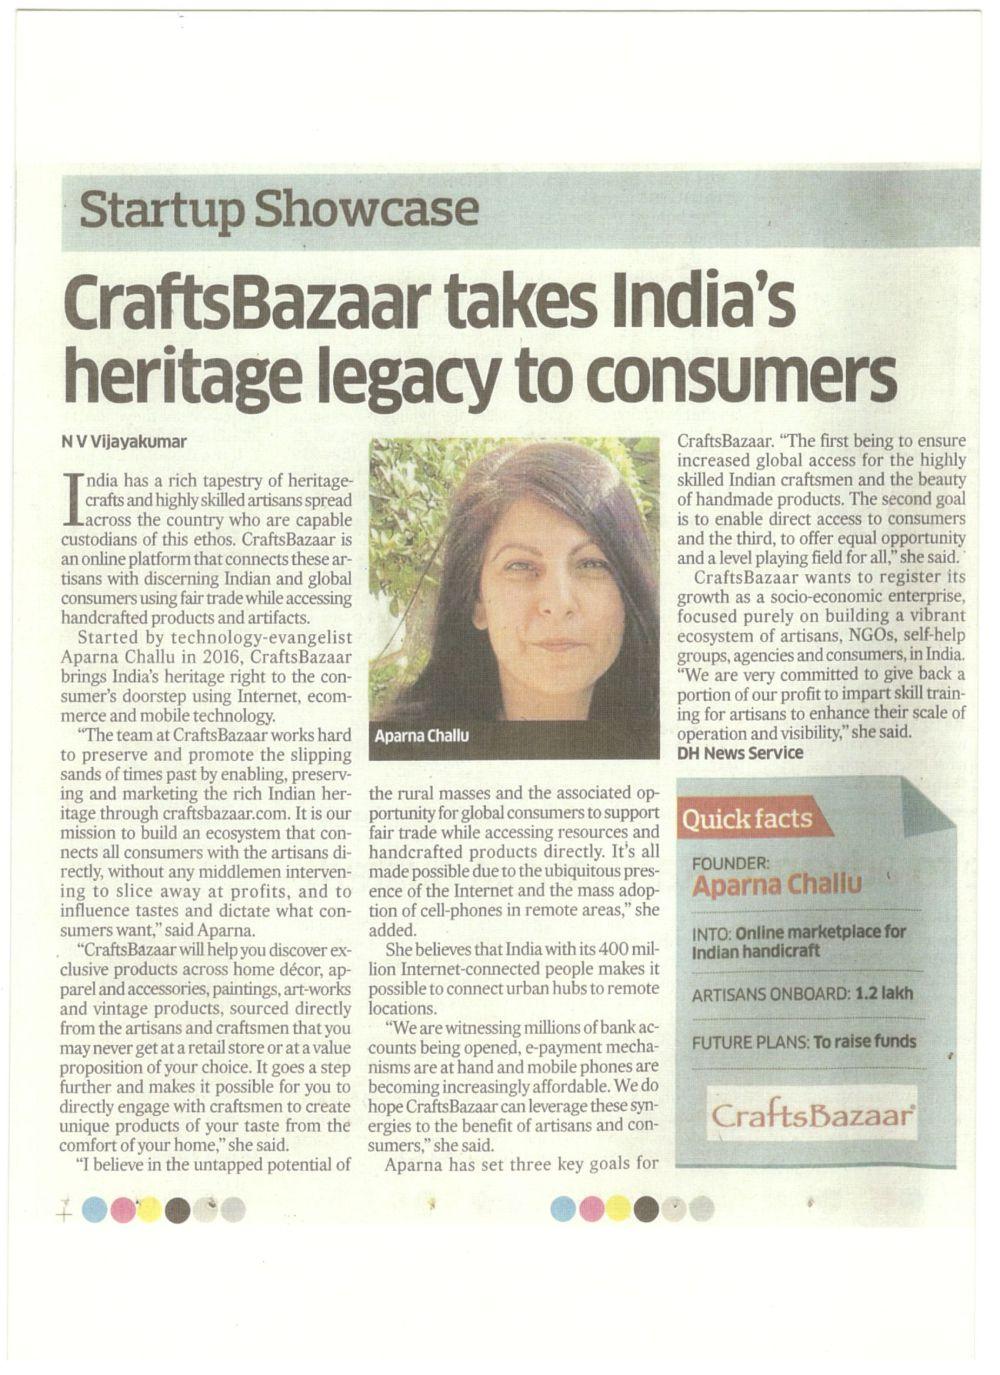 Deccan-Herald-CraftsBazaar-Aparna-Challu-CEO